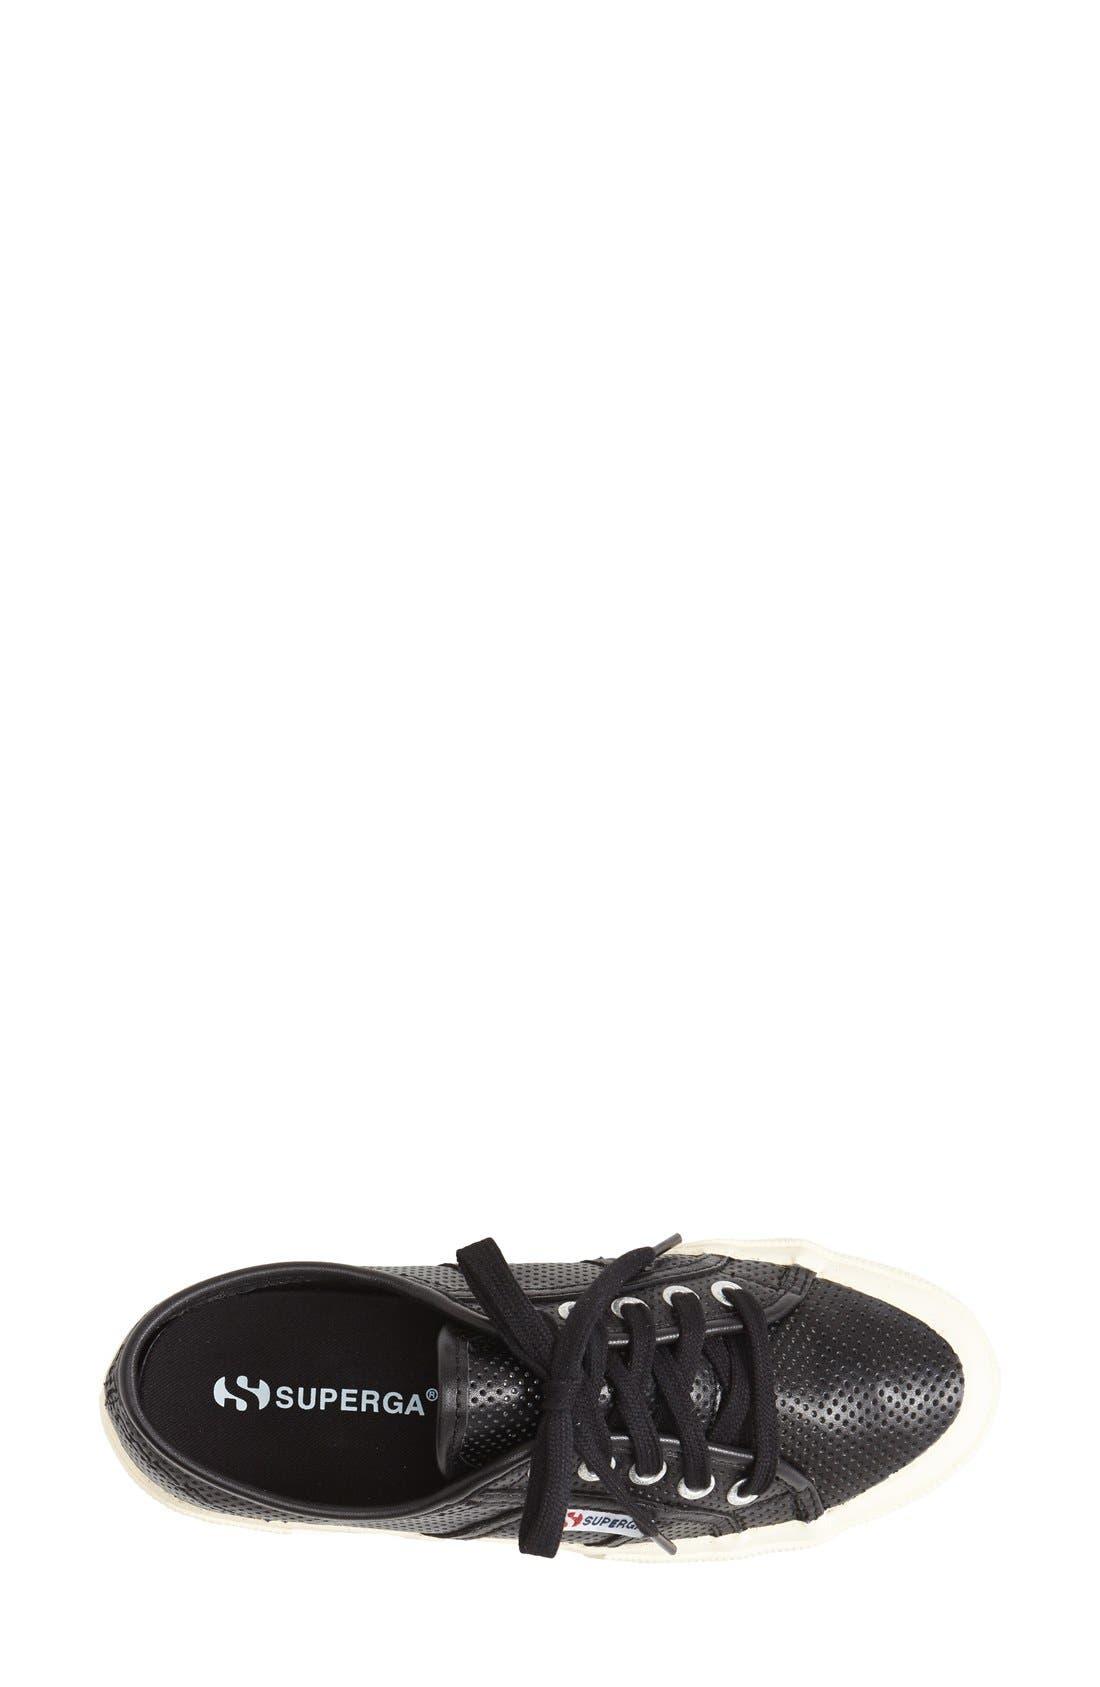 Alternate Image 3  - Superga 'Perforated Cotu' Leather Sneaker (Women)